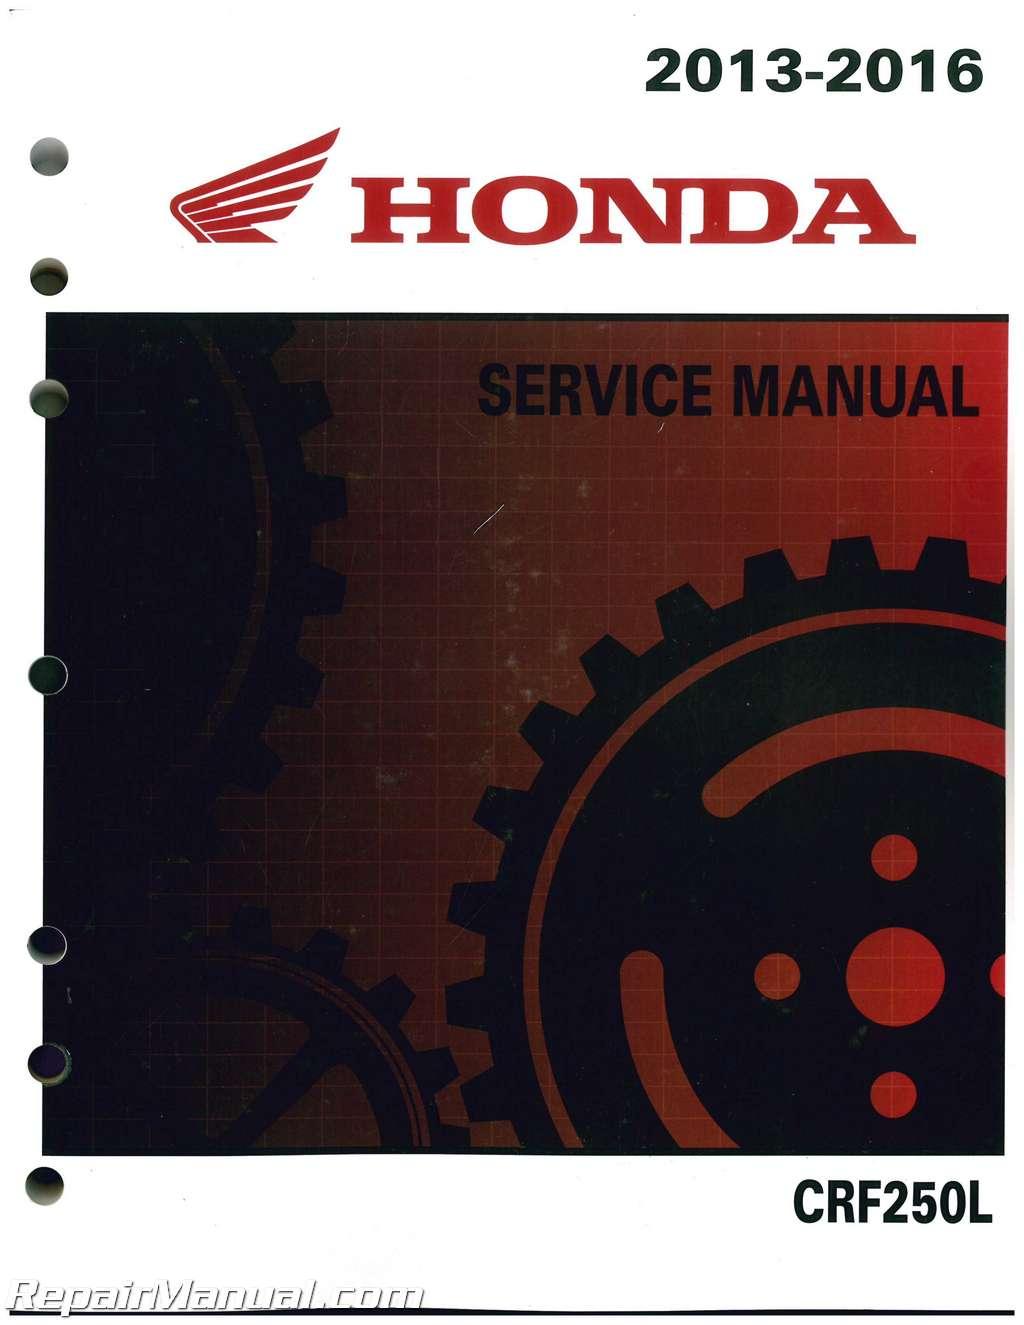 crf250l honda motorcycle service manual 2013 2016 rh repairmanual com crf250l service manual pdf 2014 crf250l service manual